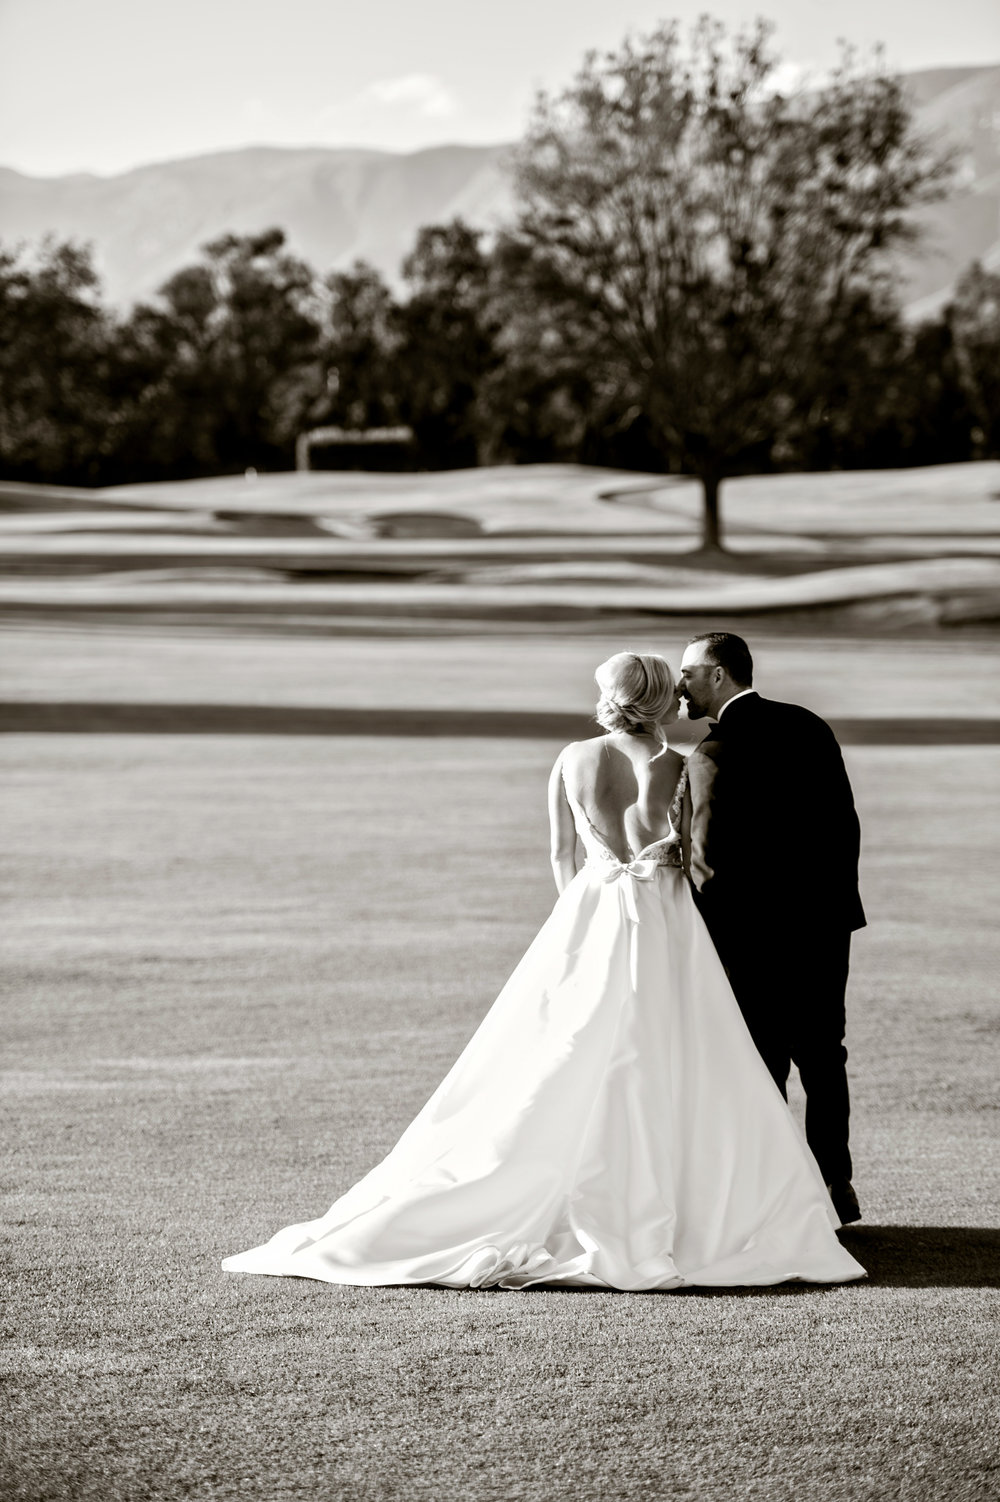 www.santabarbarawedding.com | Laurie Bailey | Ojai Valley Inn | Amber Weir Weddings | Bride and Groom